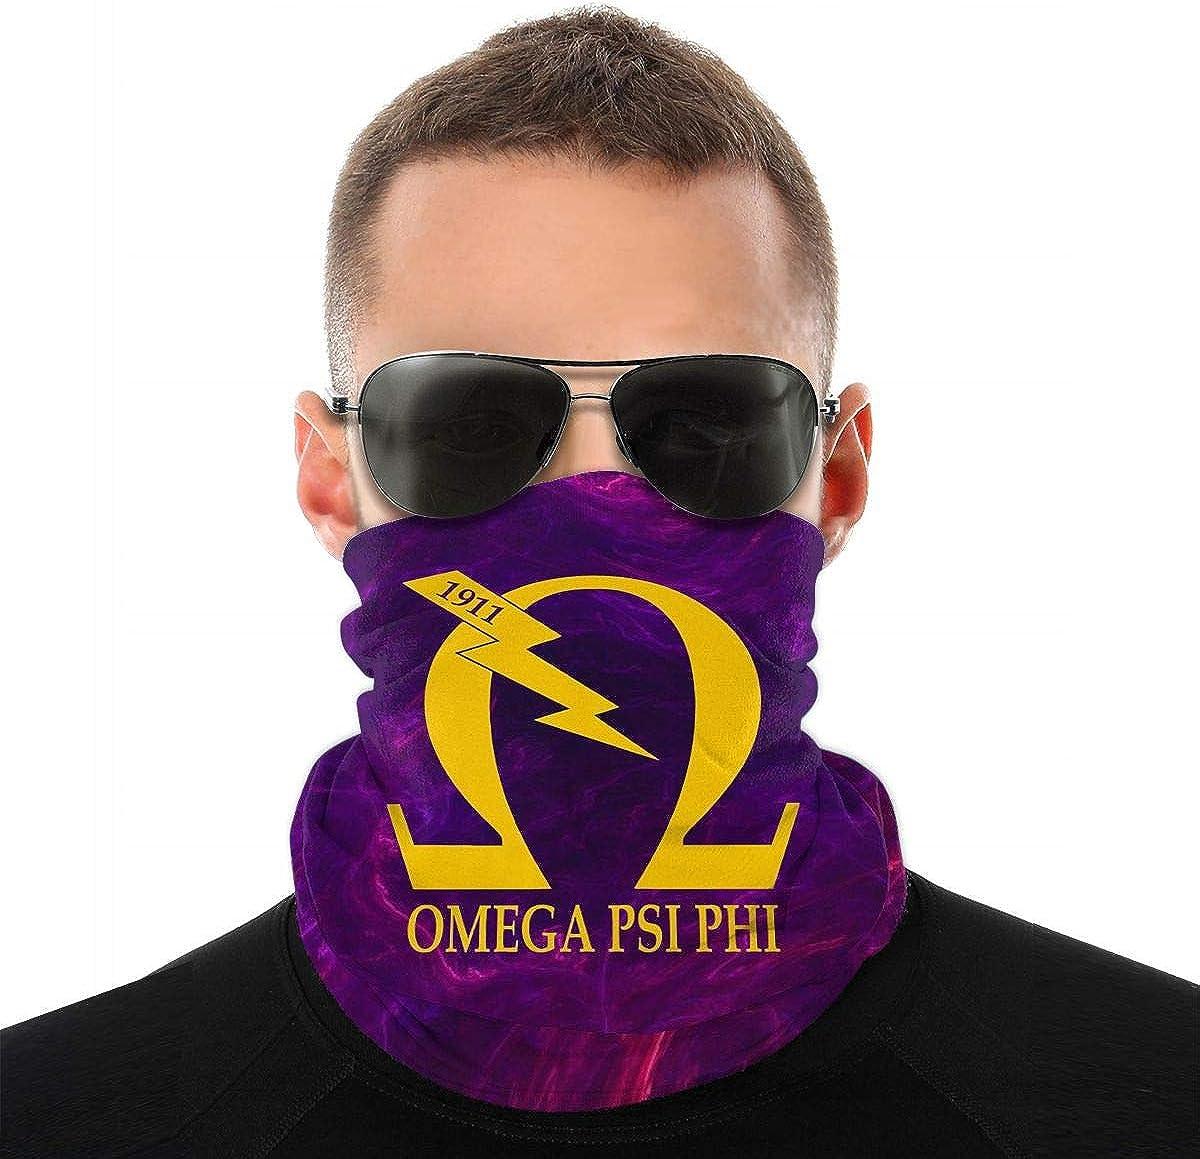 Bandana Face Mask Magic Scarf Headwrap Balaclava Motorcycle Neck Gaiter Outdoor Omega Psi Phi